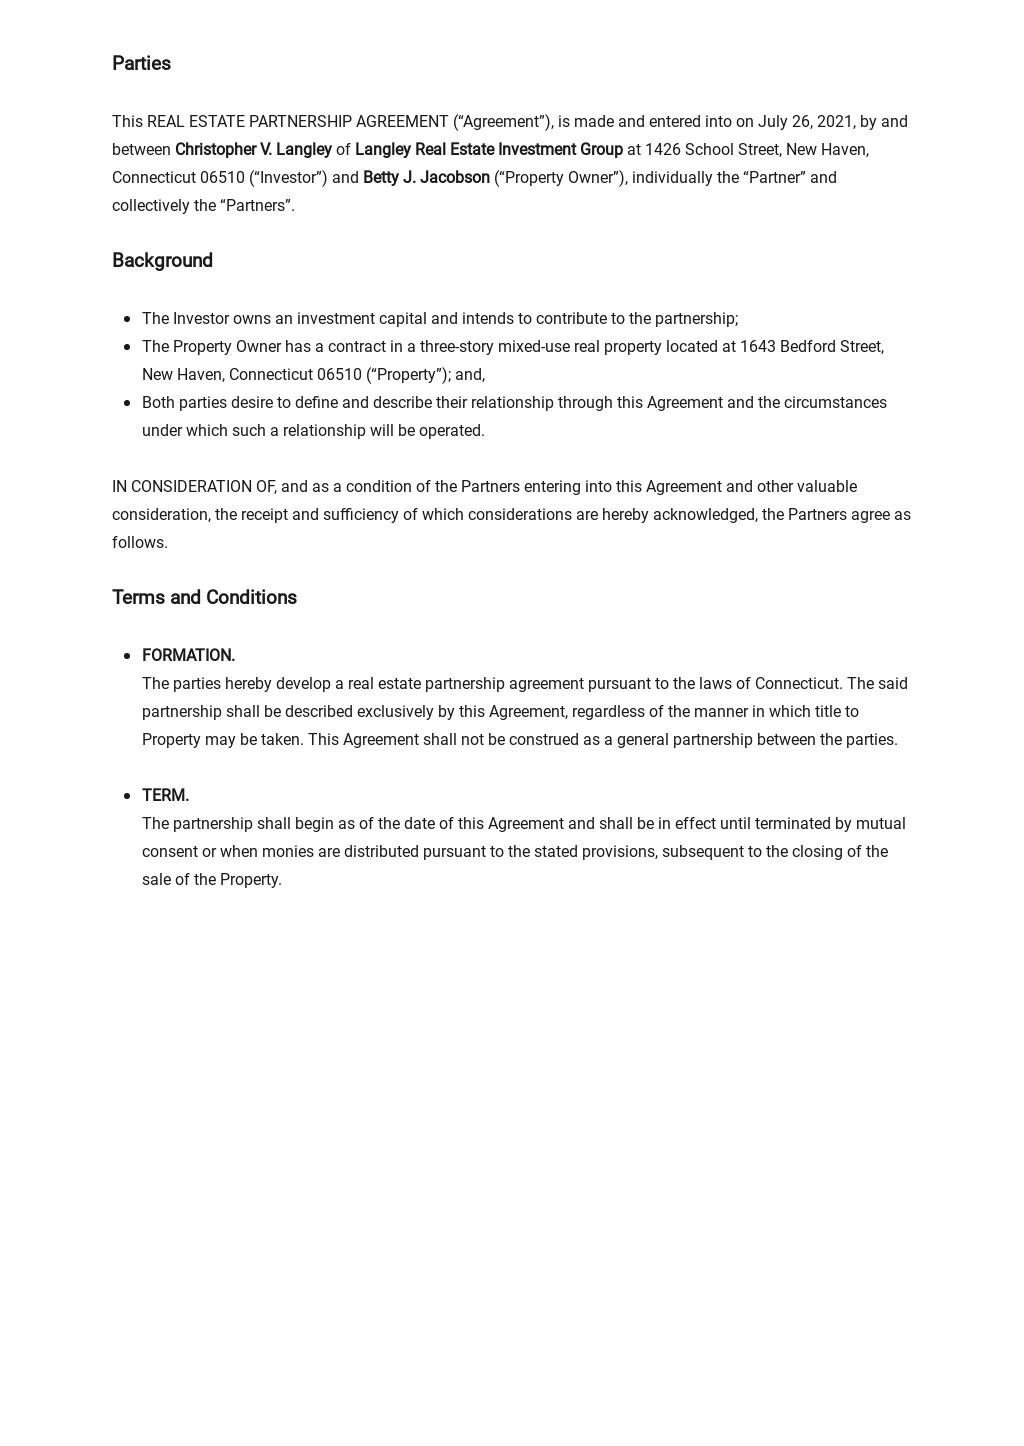 Real Estate Partnership Agreement Template 1.jpe